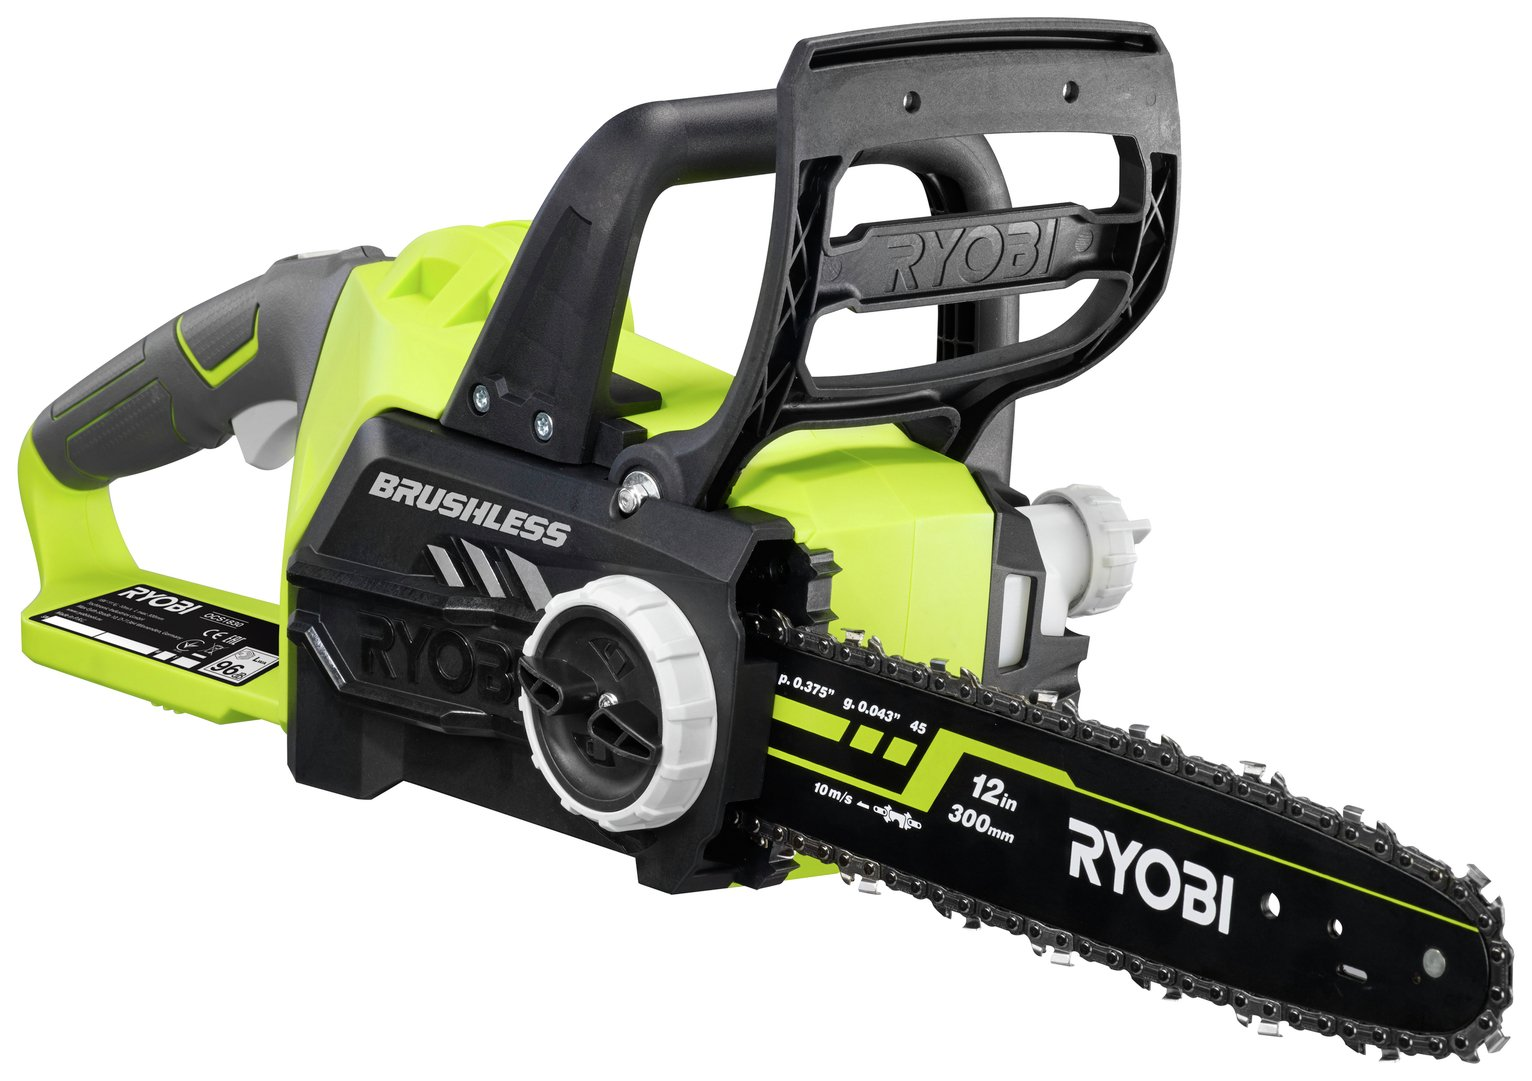 Ryobi OCS1830 30cm Cordless Bare Chainsaw - No Battery at Argos